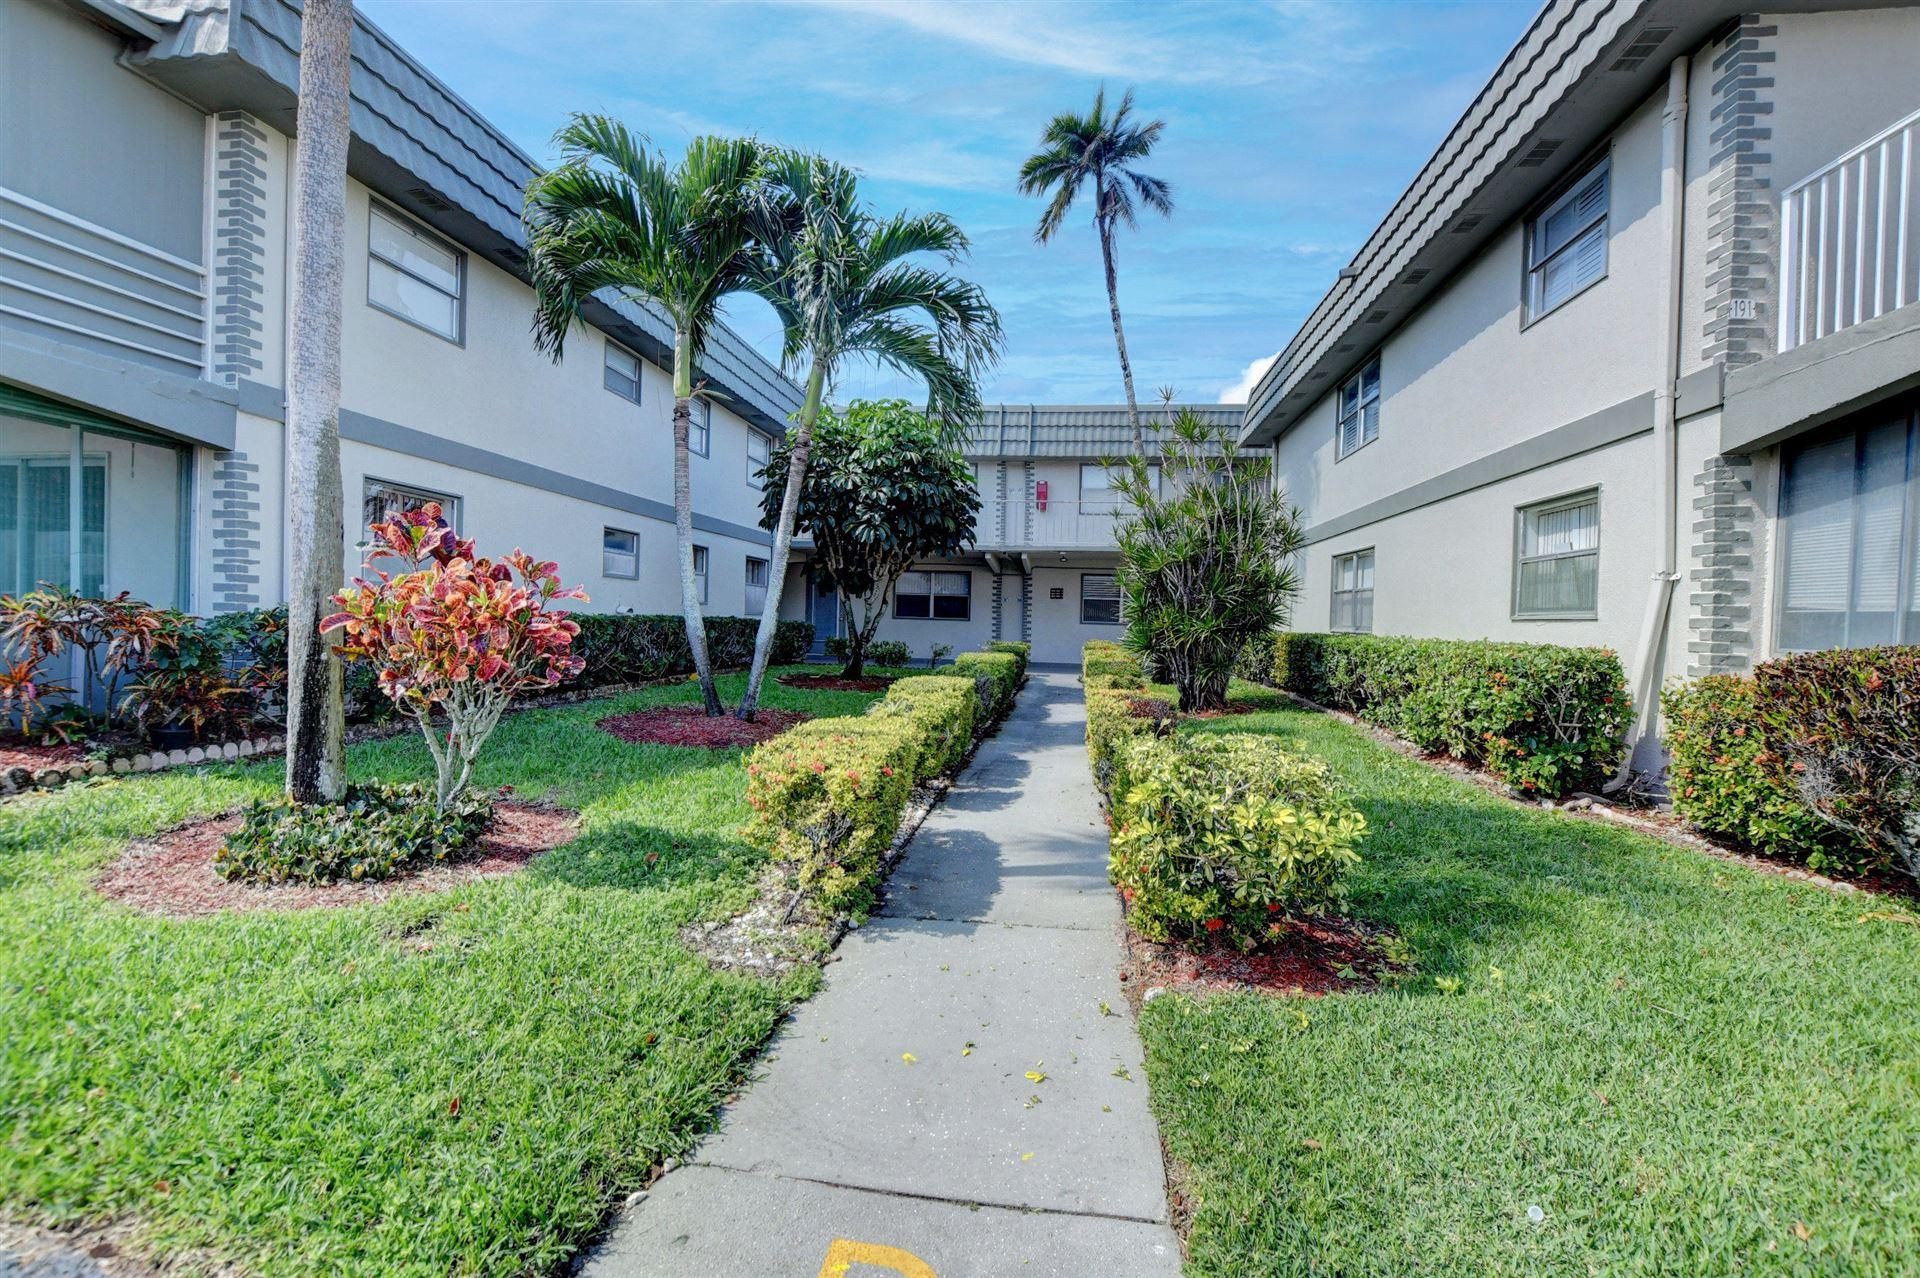 166 Brittany D, Delray Beach, FL 33446 - MLS#: RX-10694734